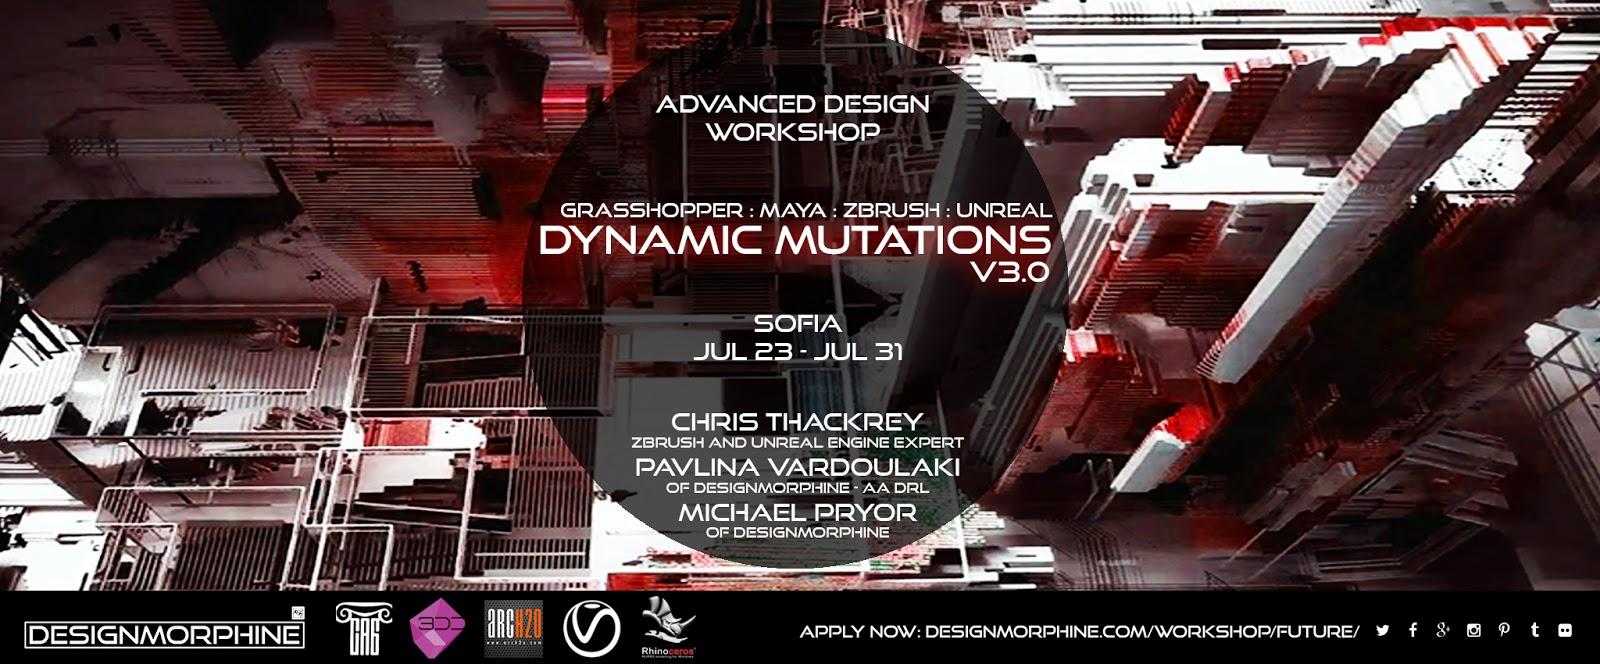 DYNAMIC MUTATIONS V3.0 WORKSHOP